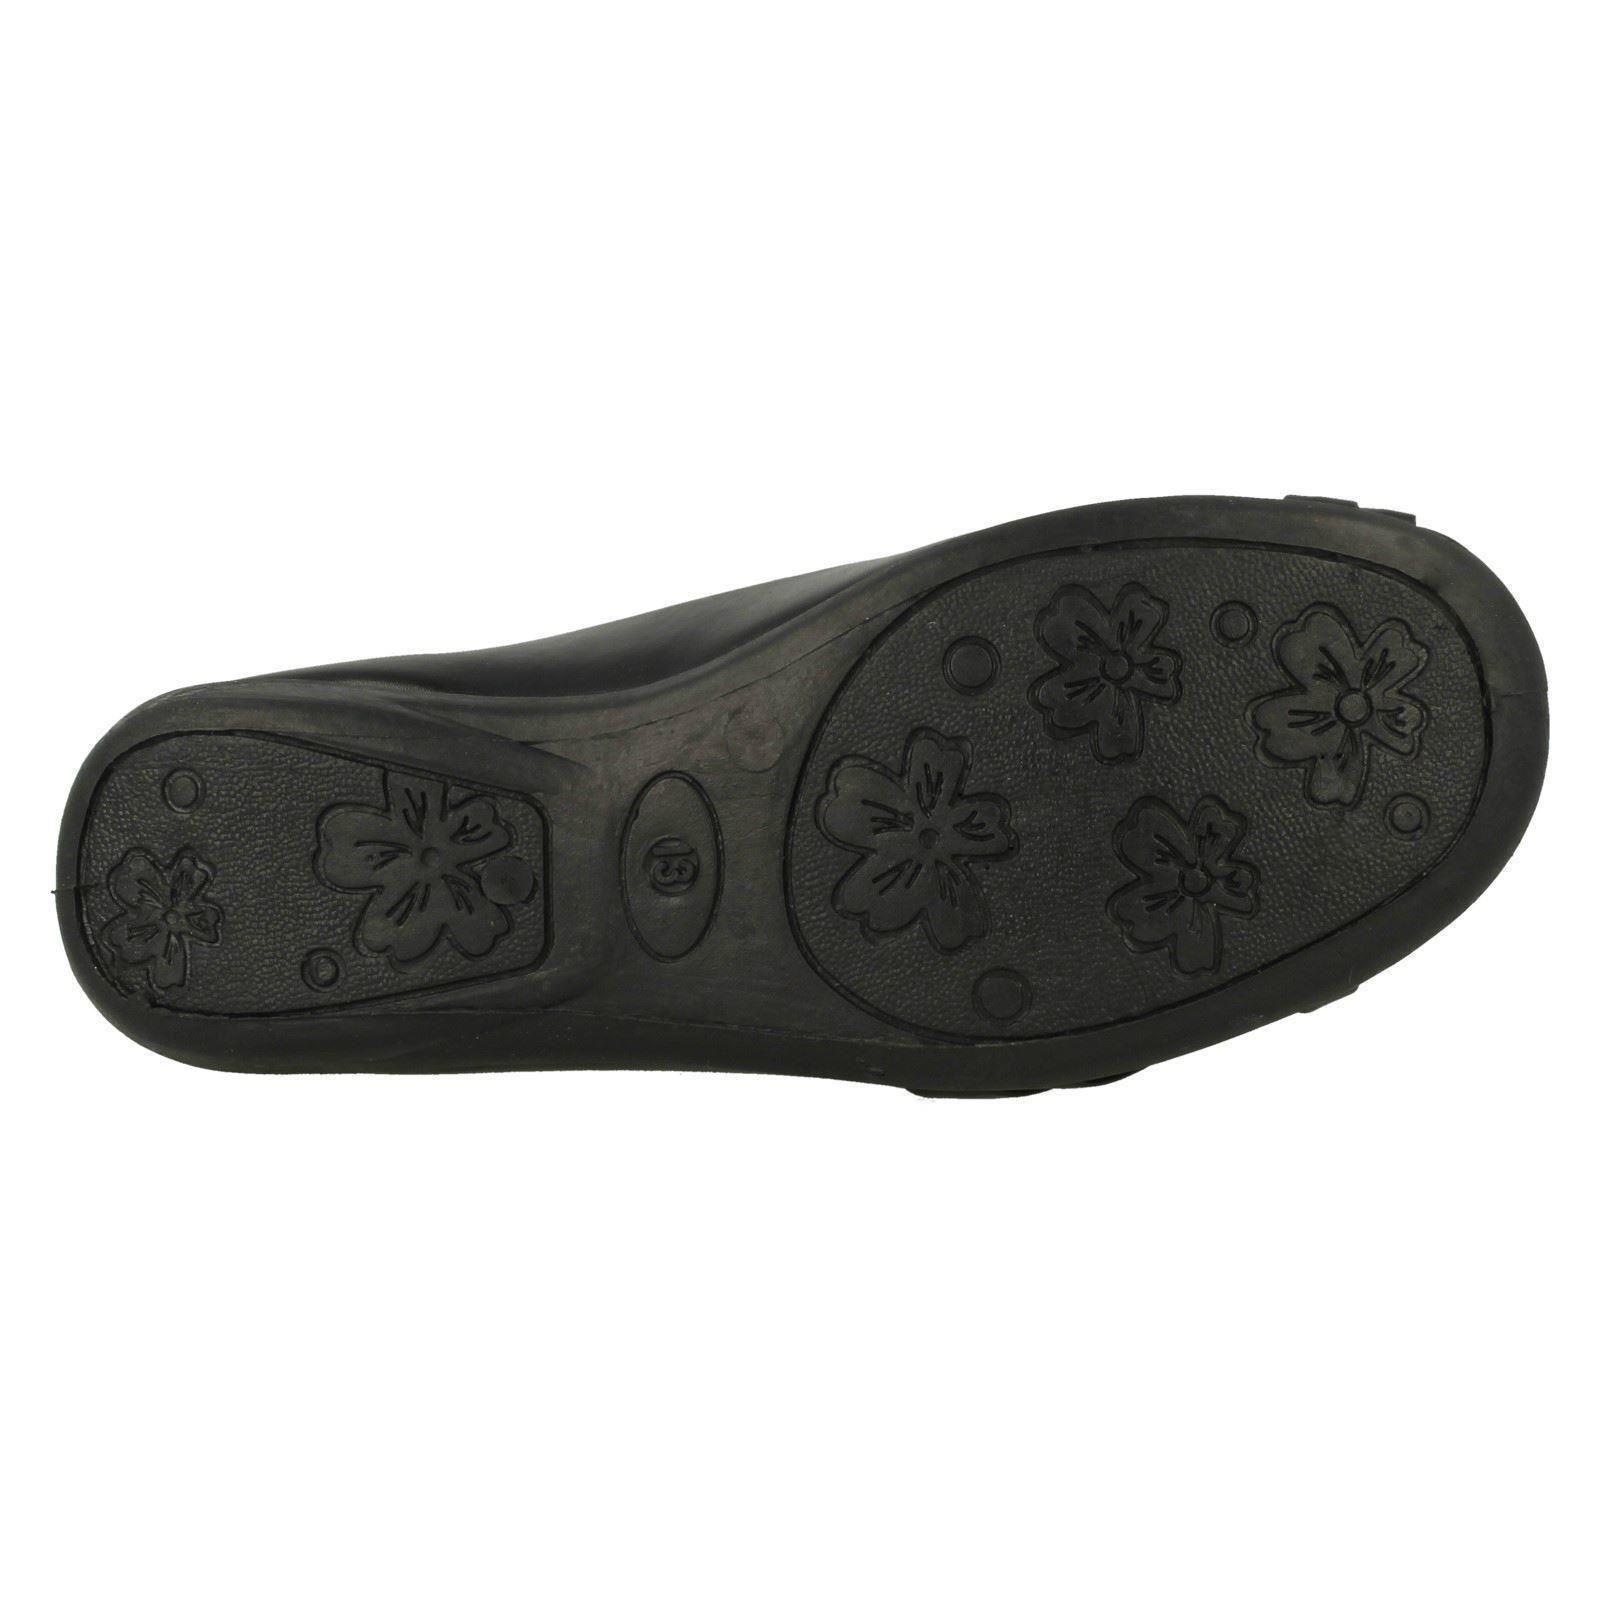 Girls Spot On Flat Shoes H2379